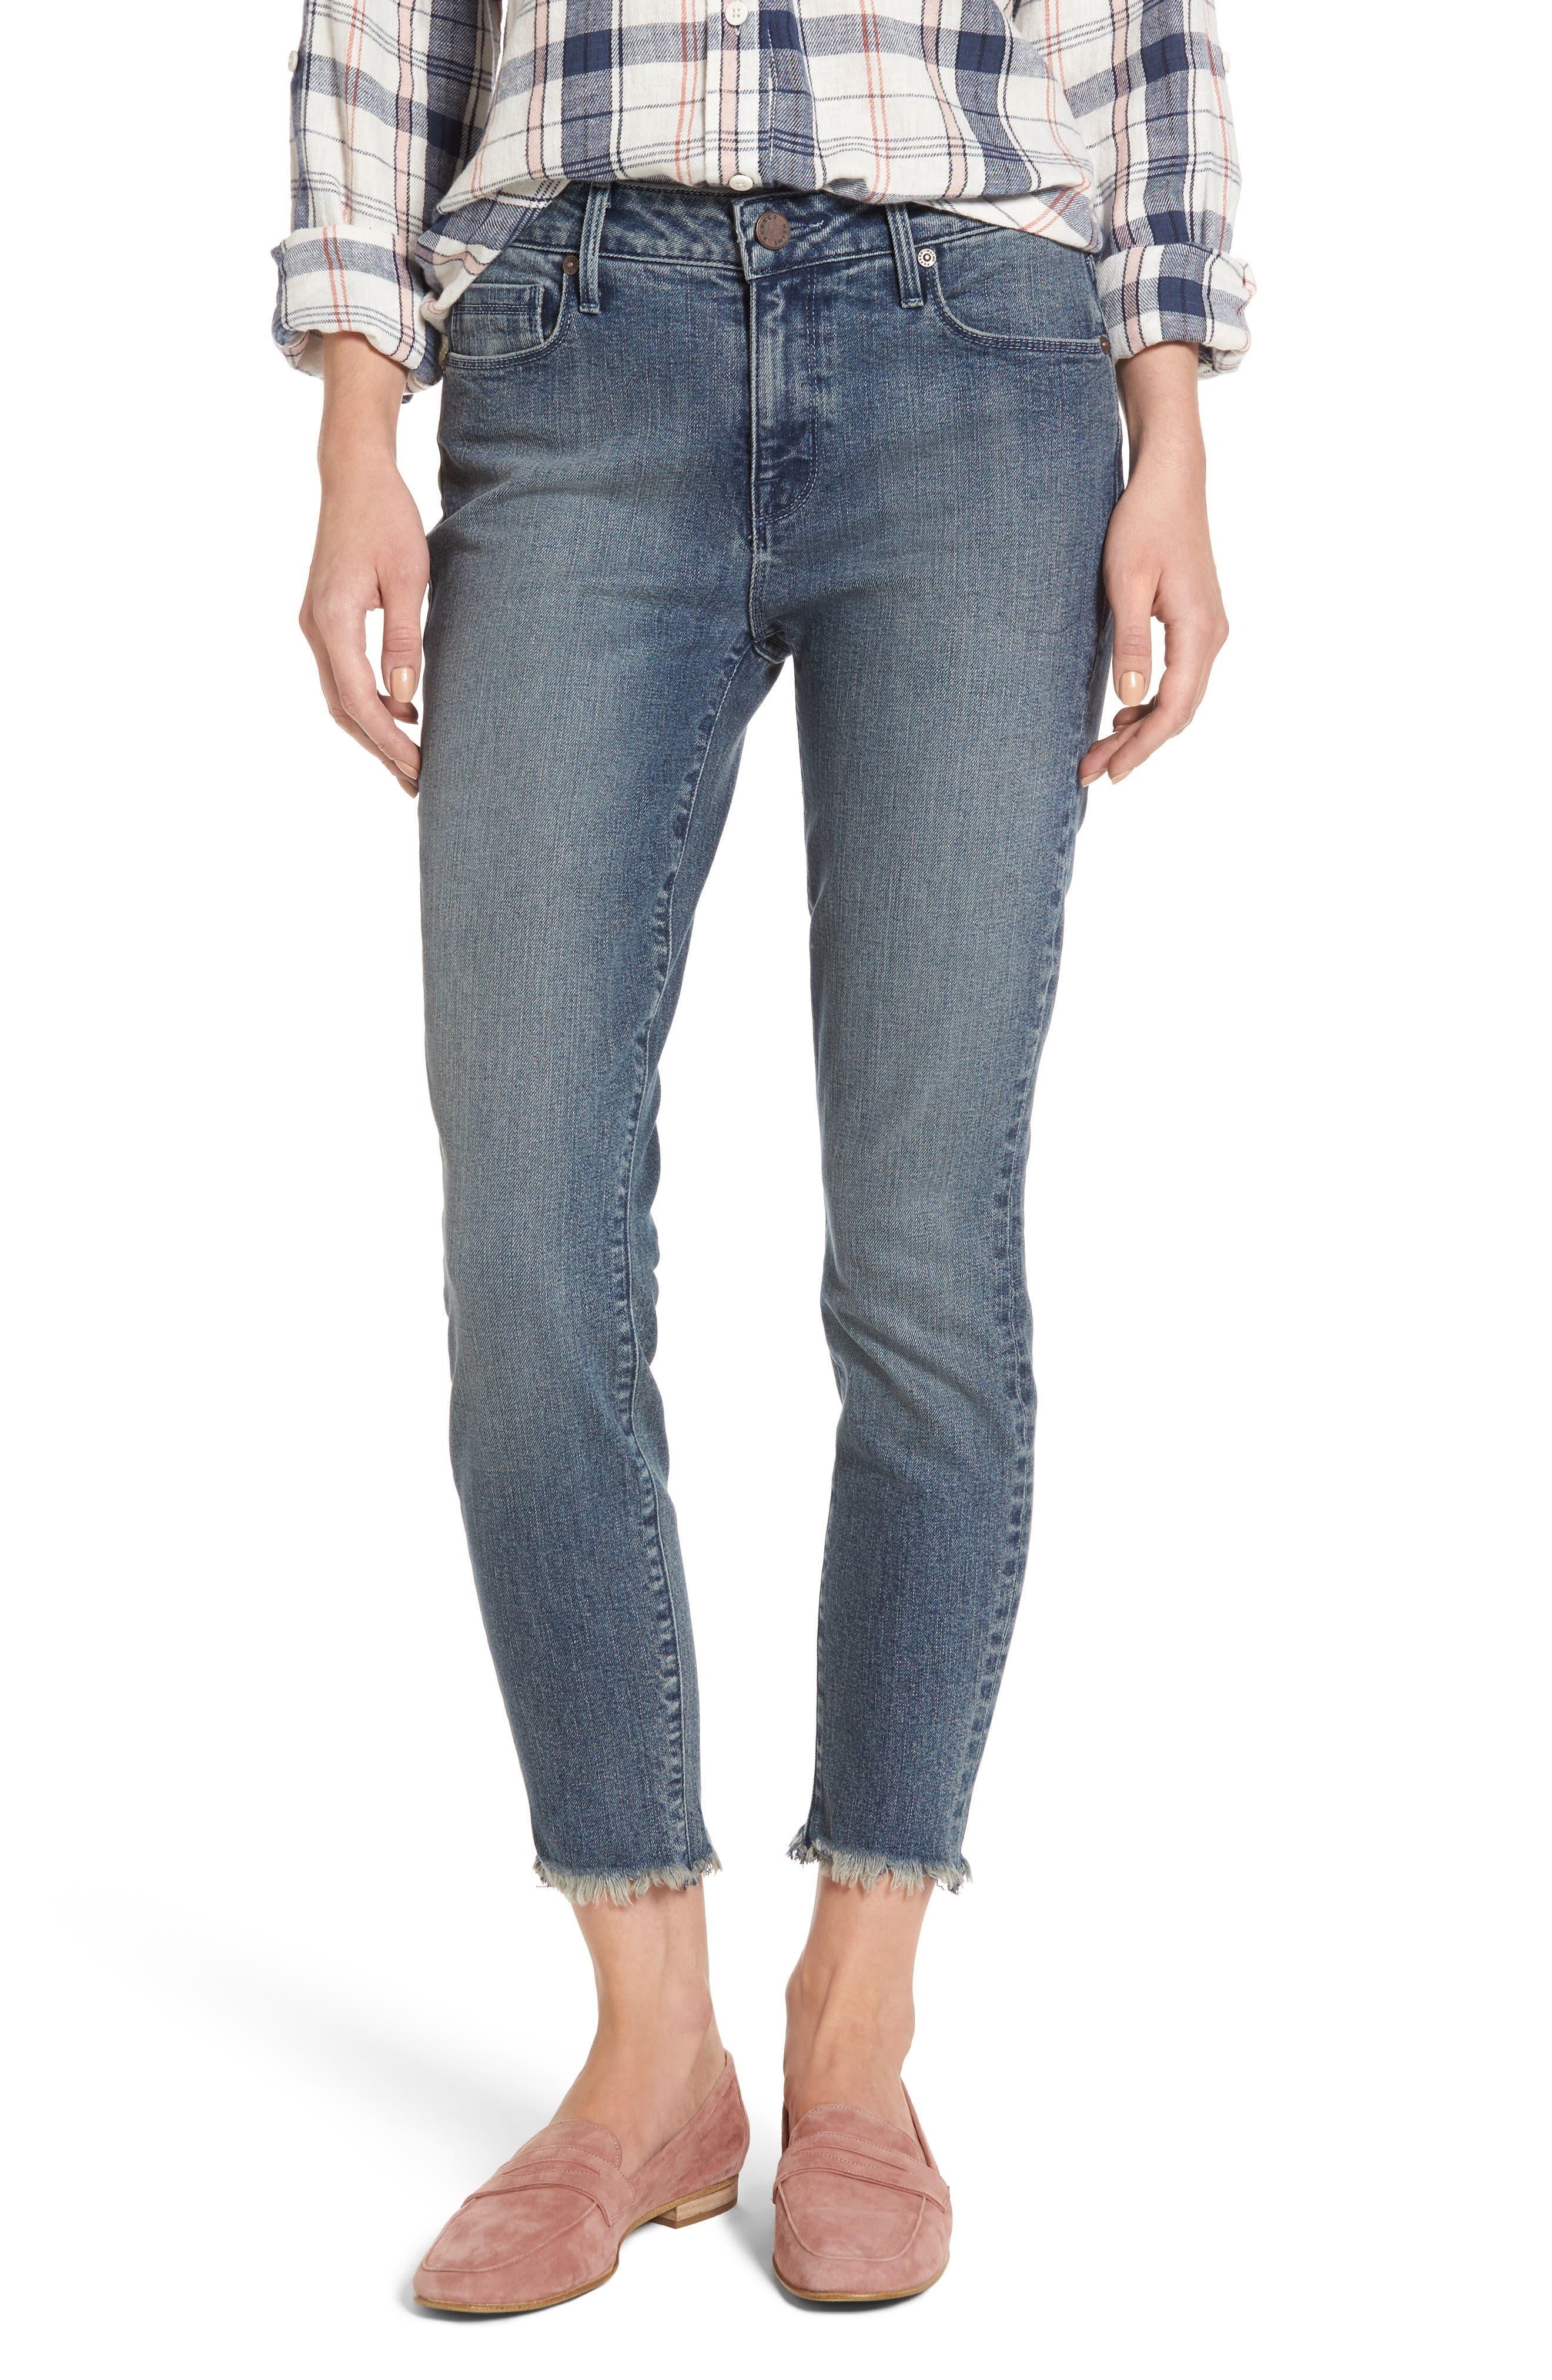 Alternate Image 1 Selected - PARKER SMITH Ava Crop Skinny Jeans (Madeline)